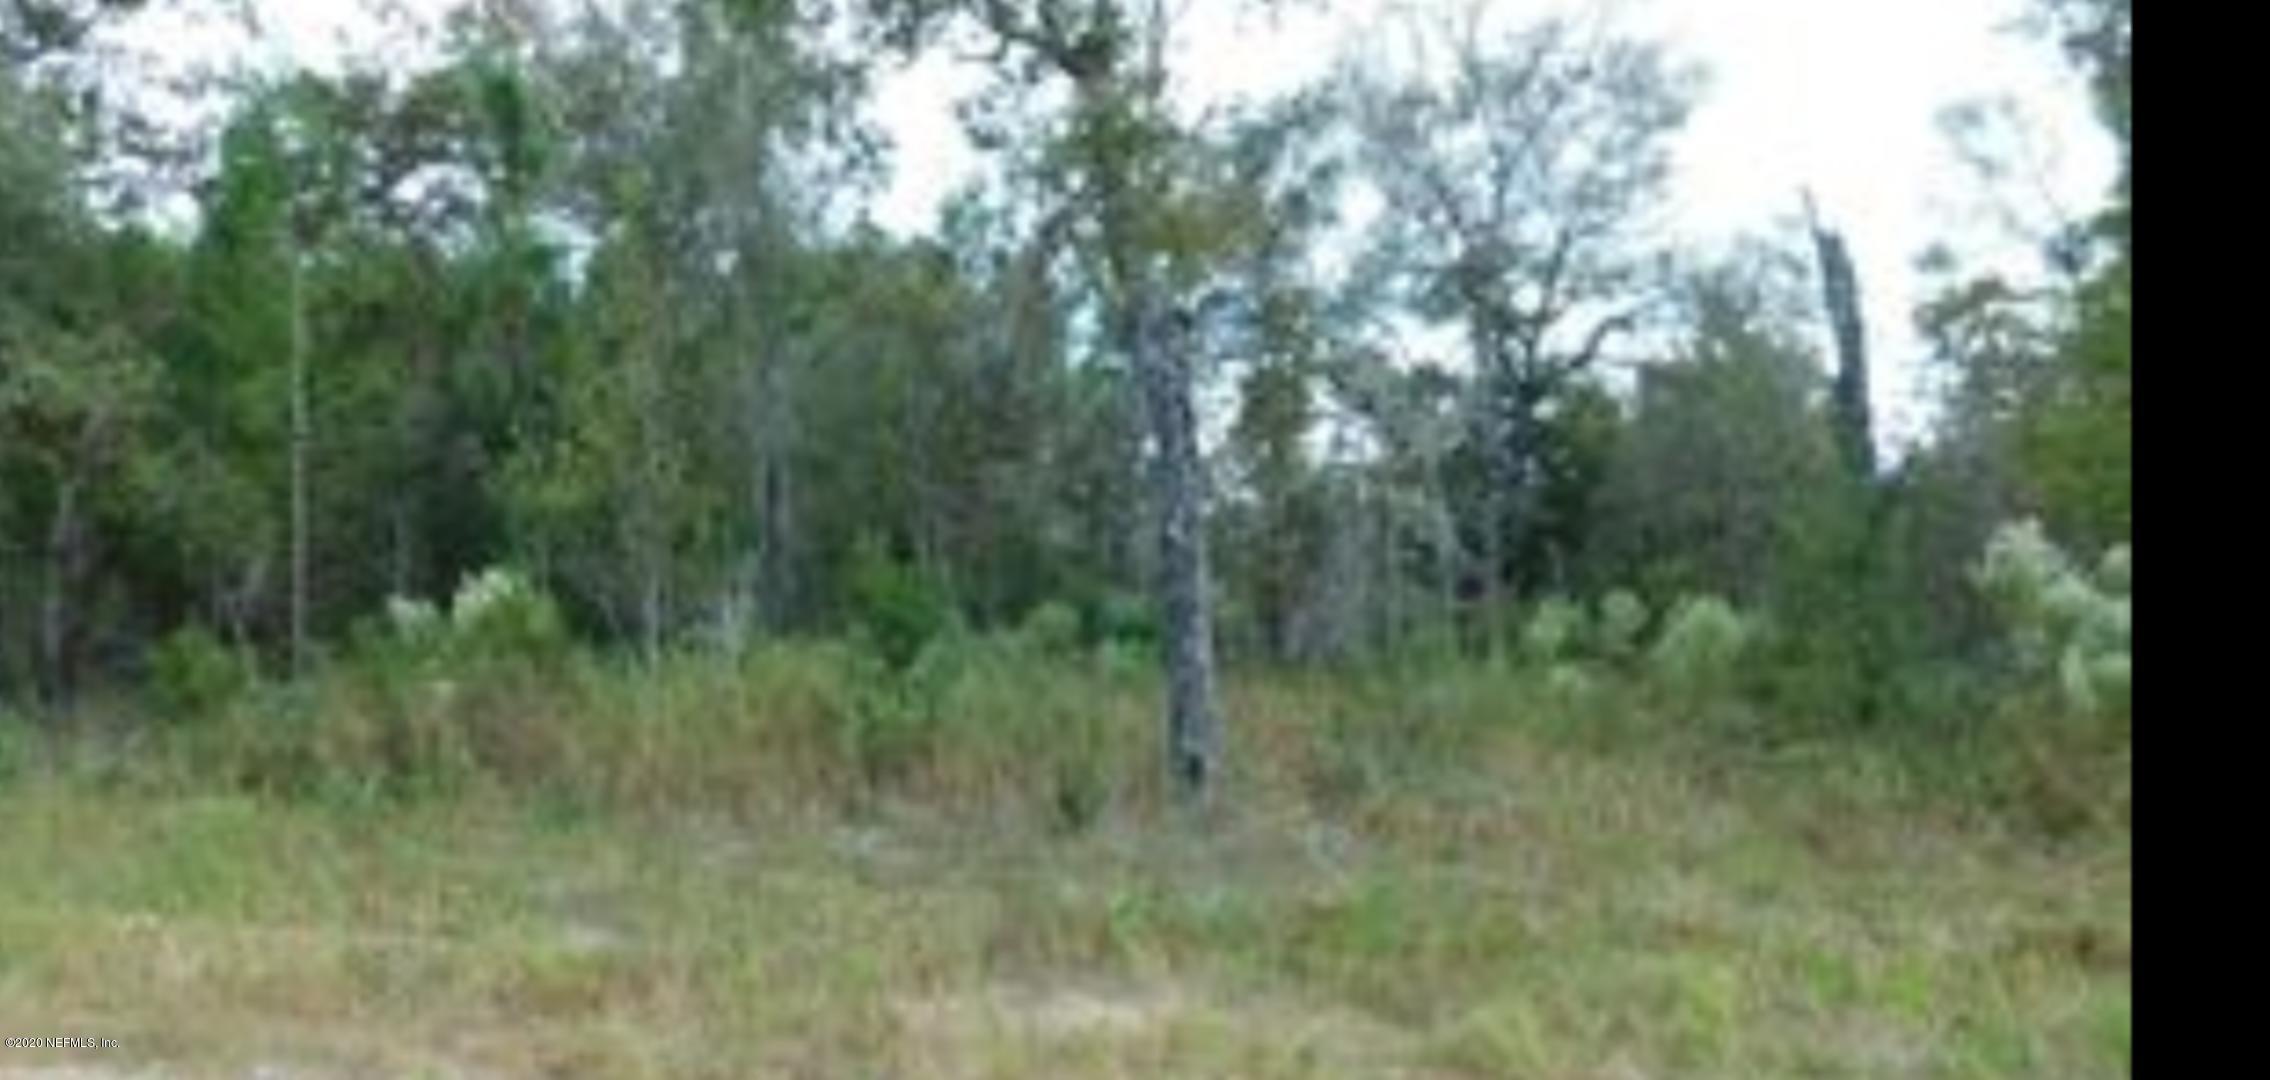 0 UNASSIGNED, INTERLACHEN, FLORIDA 32148, ,Vacant land,For sale,UNASSIGNED,1034653